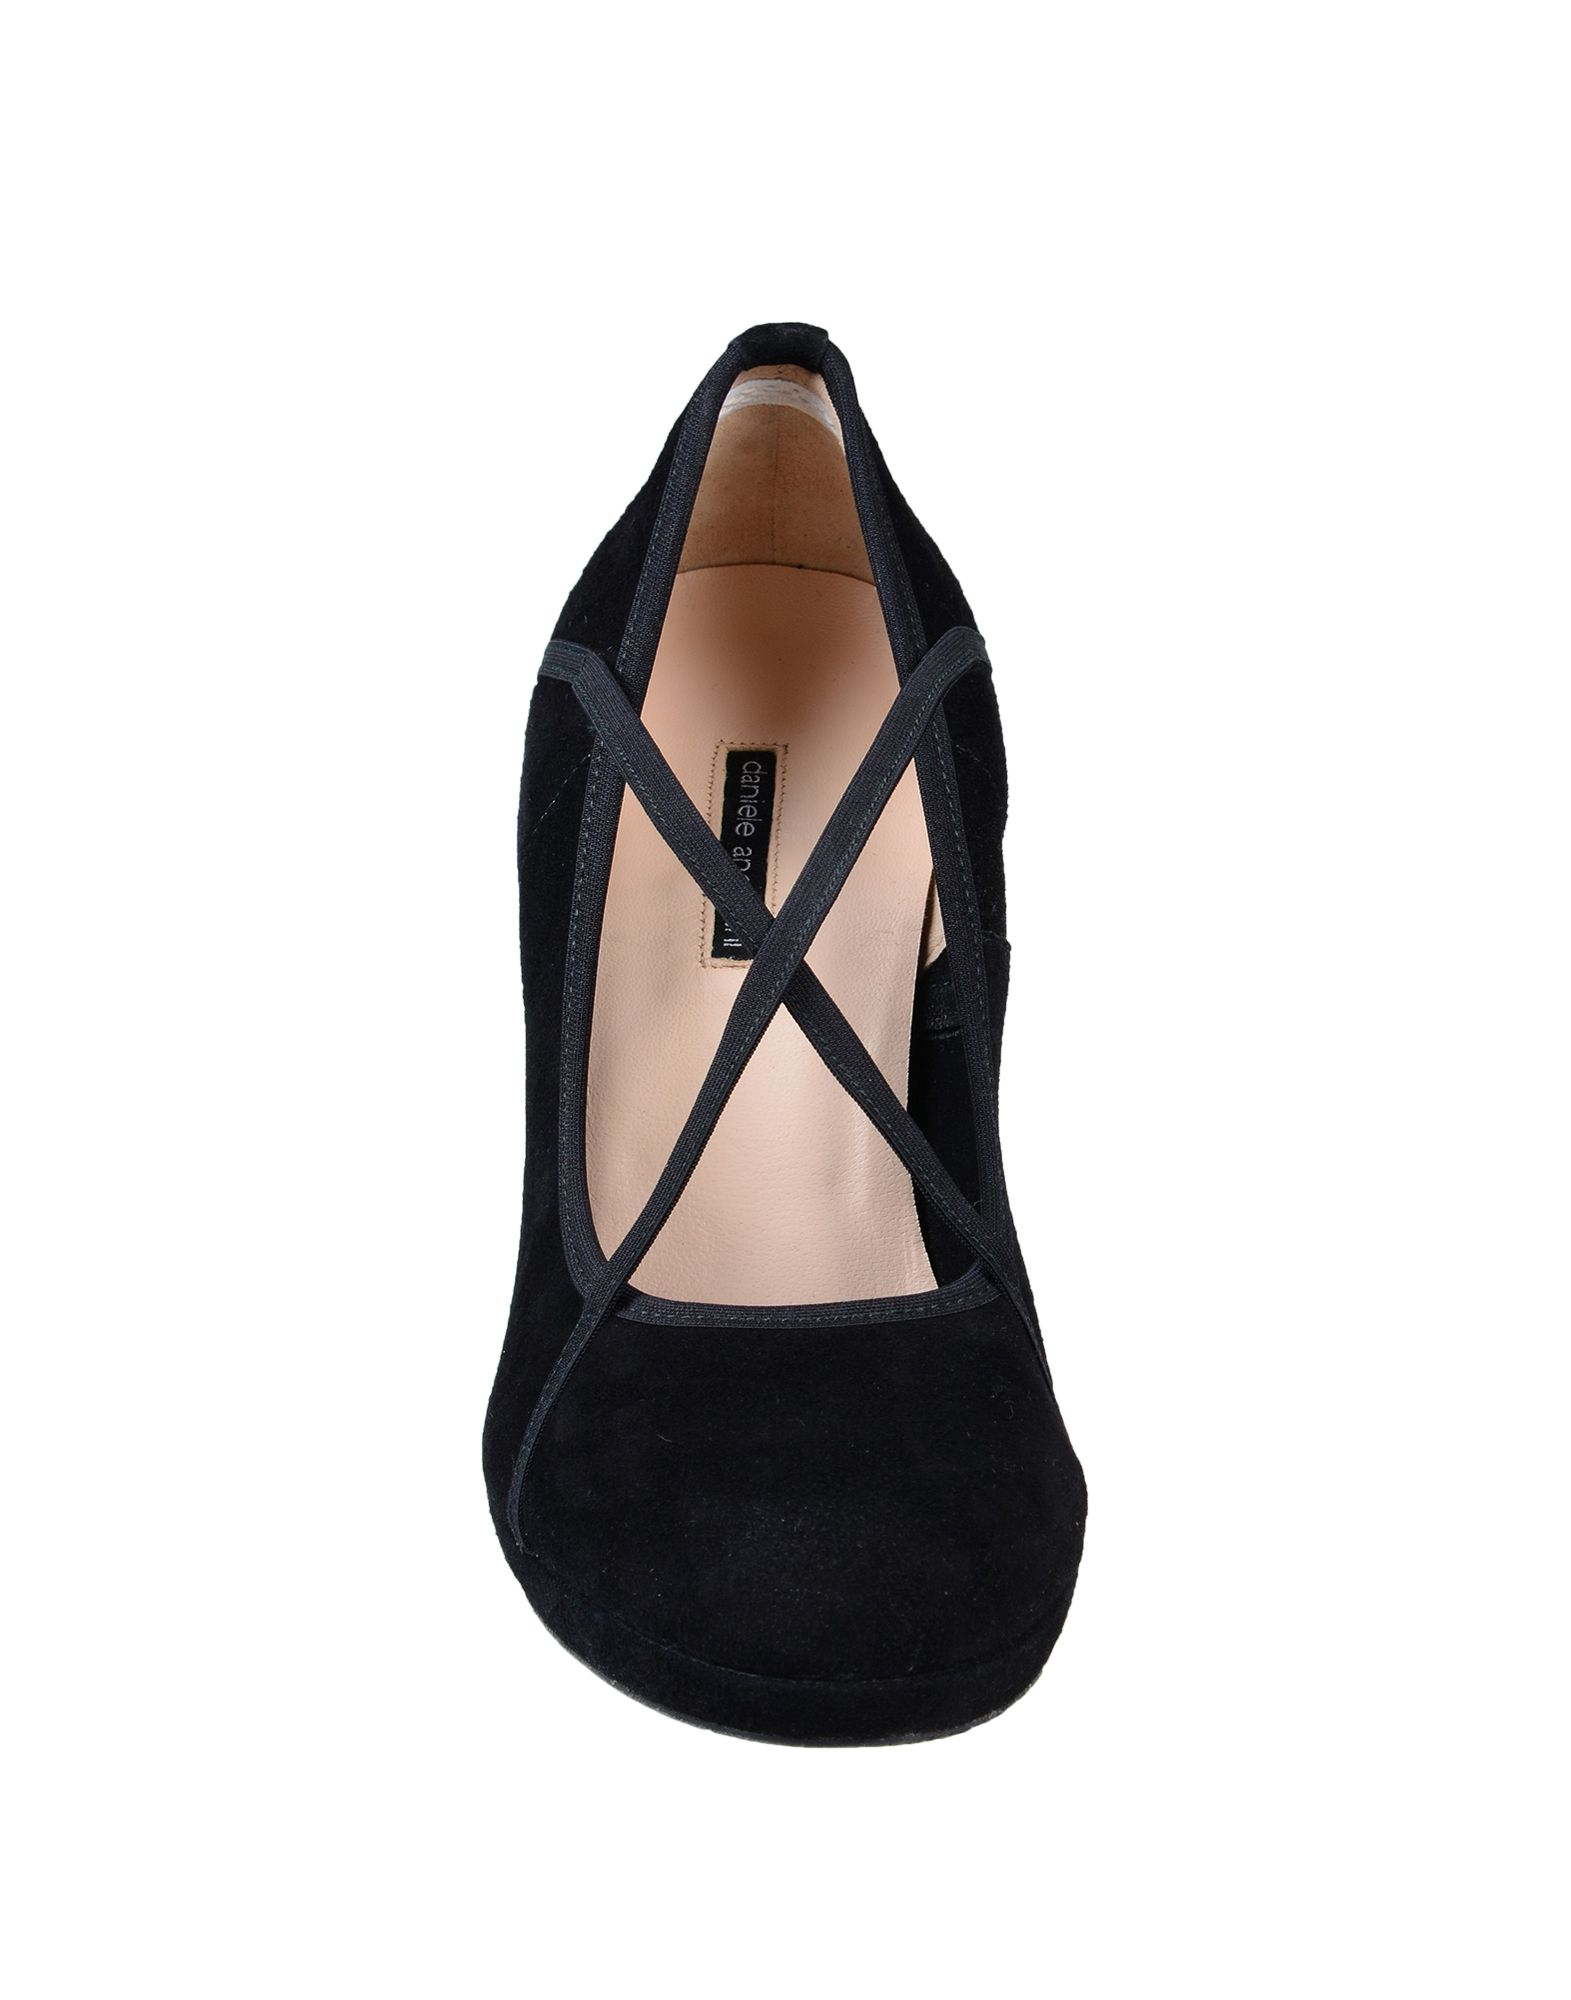 Stilvolle billige Schuhe Daniele Ancarani 11514622TV Pumps Damen  11514622TV Ancarani 974b44